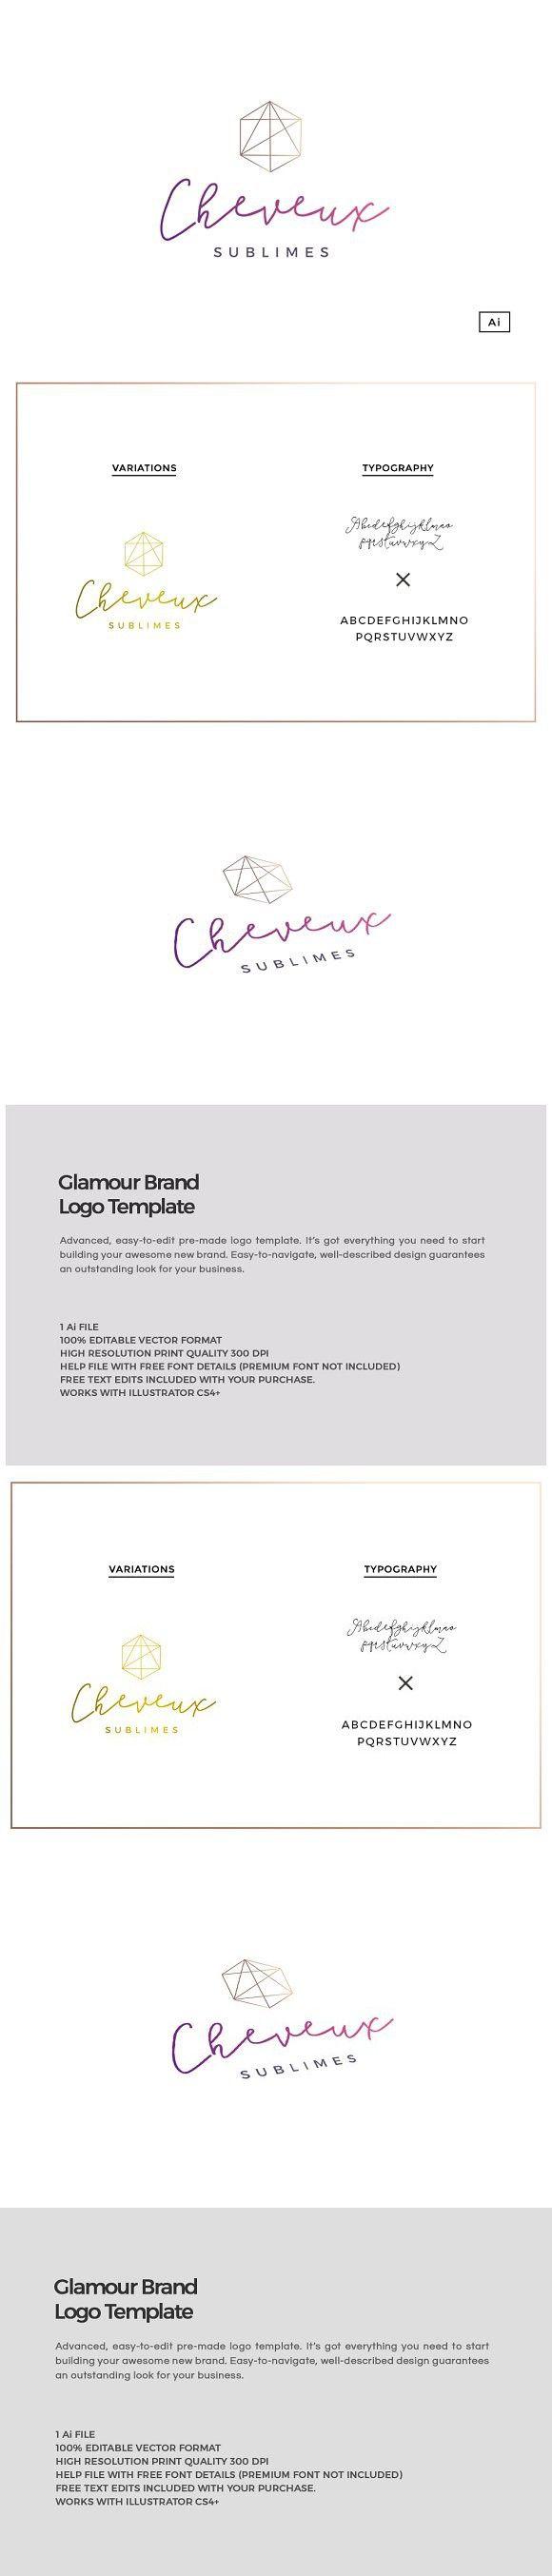 Glamour Brand Logo Template. Wedding Card Templates. $30.00